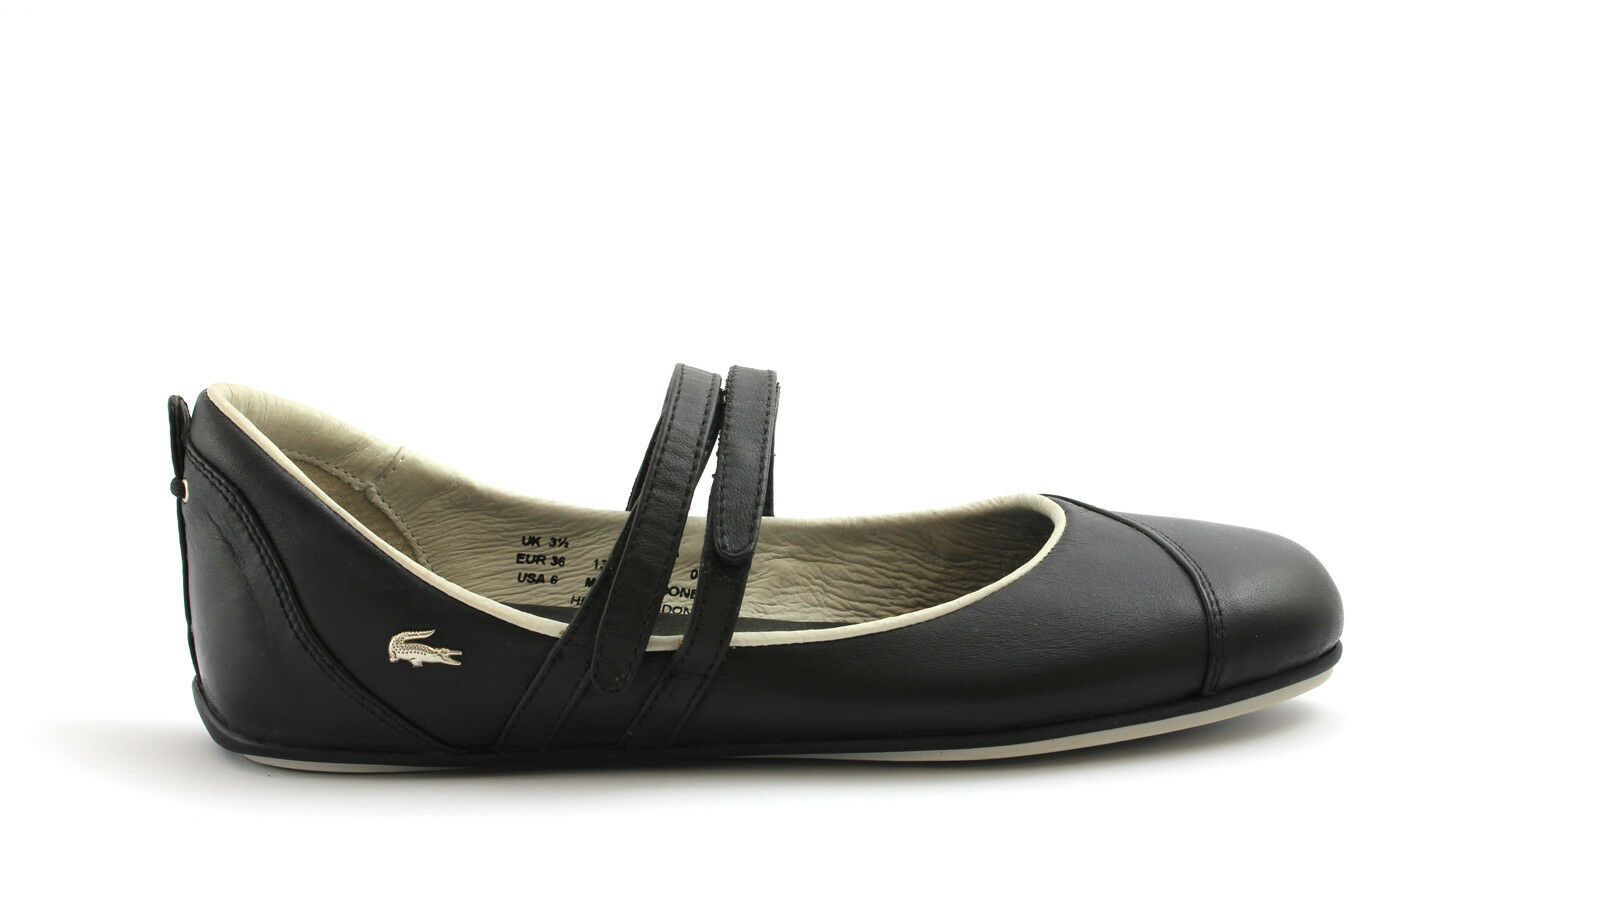 Scarpa Lacoste irina irina irina lady ballerina | Moderato Prezzo  | Sig/Sig Ra Scarpa  20f175